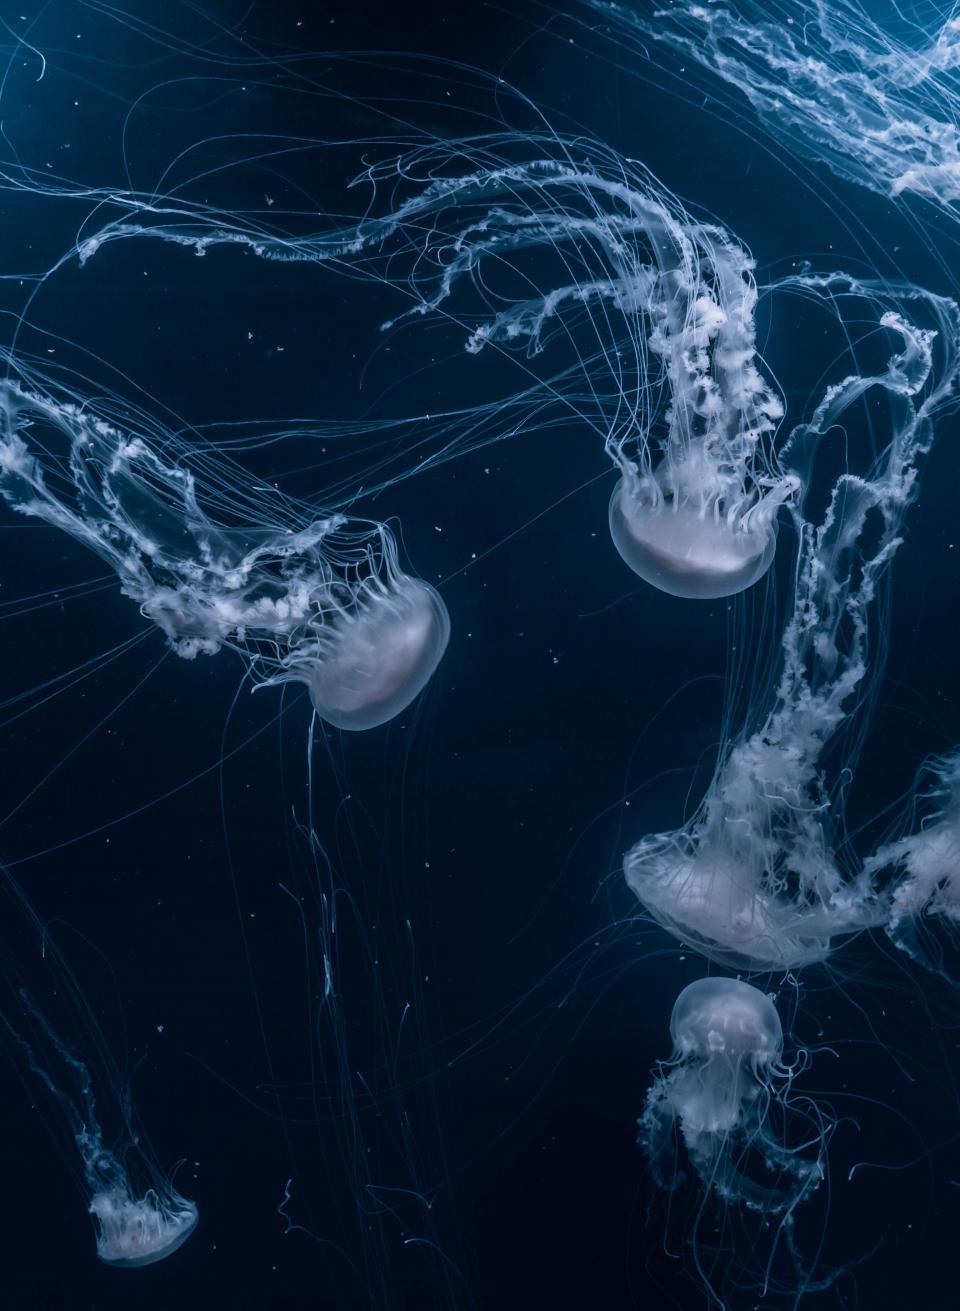 jellyfish, aquatic, animal, ocean, underwater, blue, water